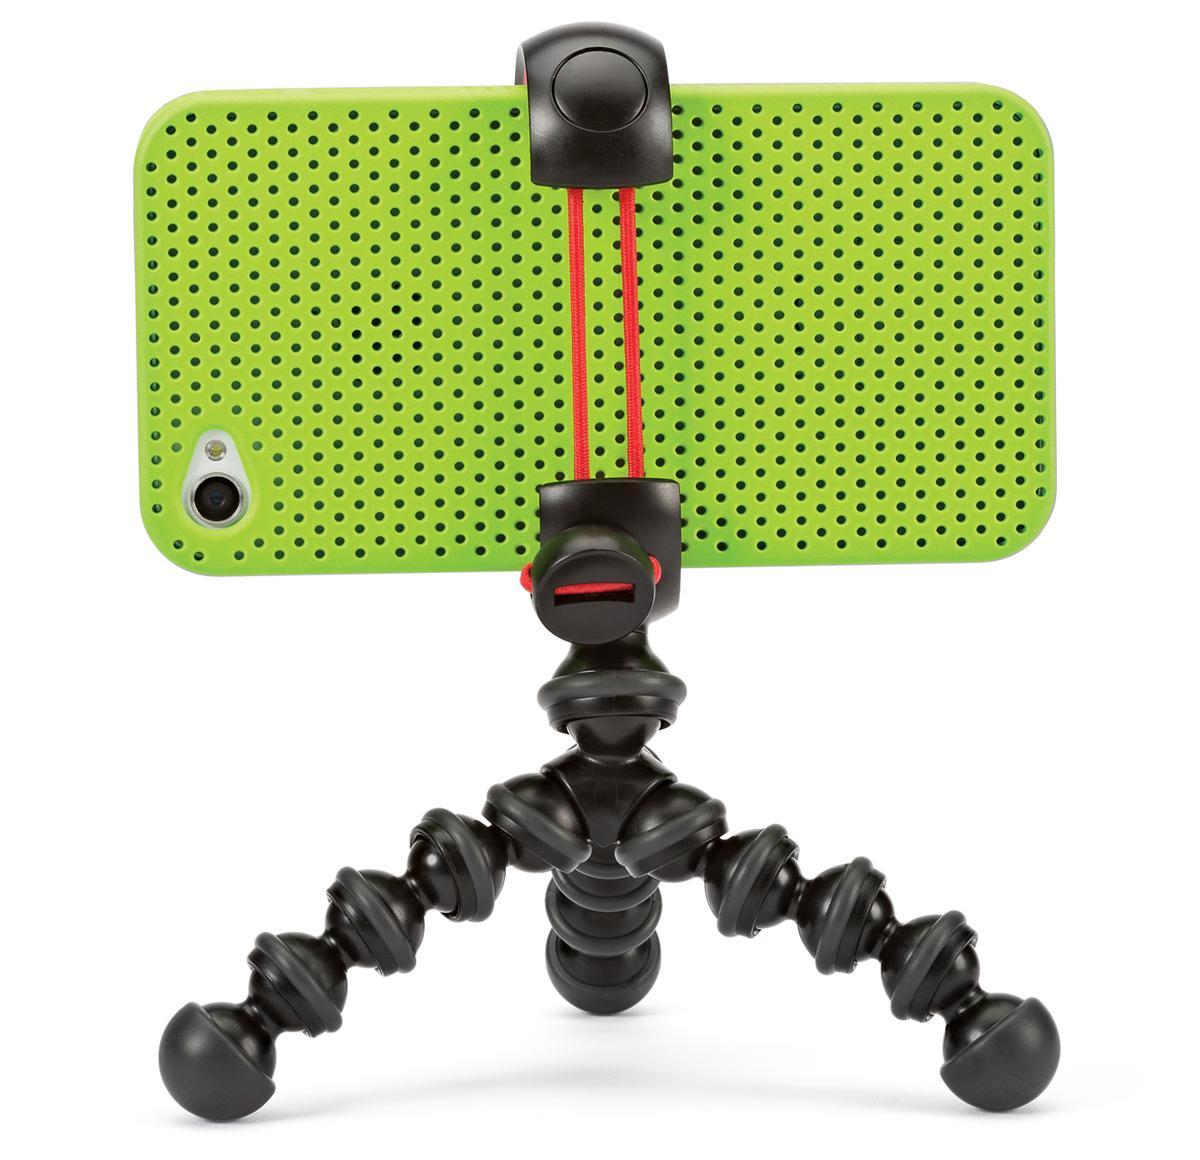 The Joby MPod Mini Stand fits most popular smartphones